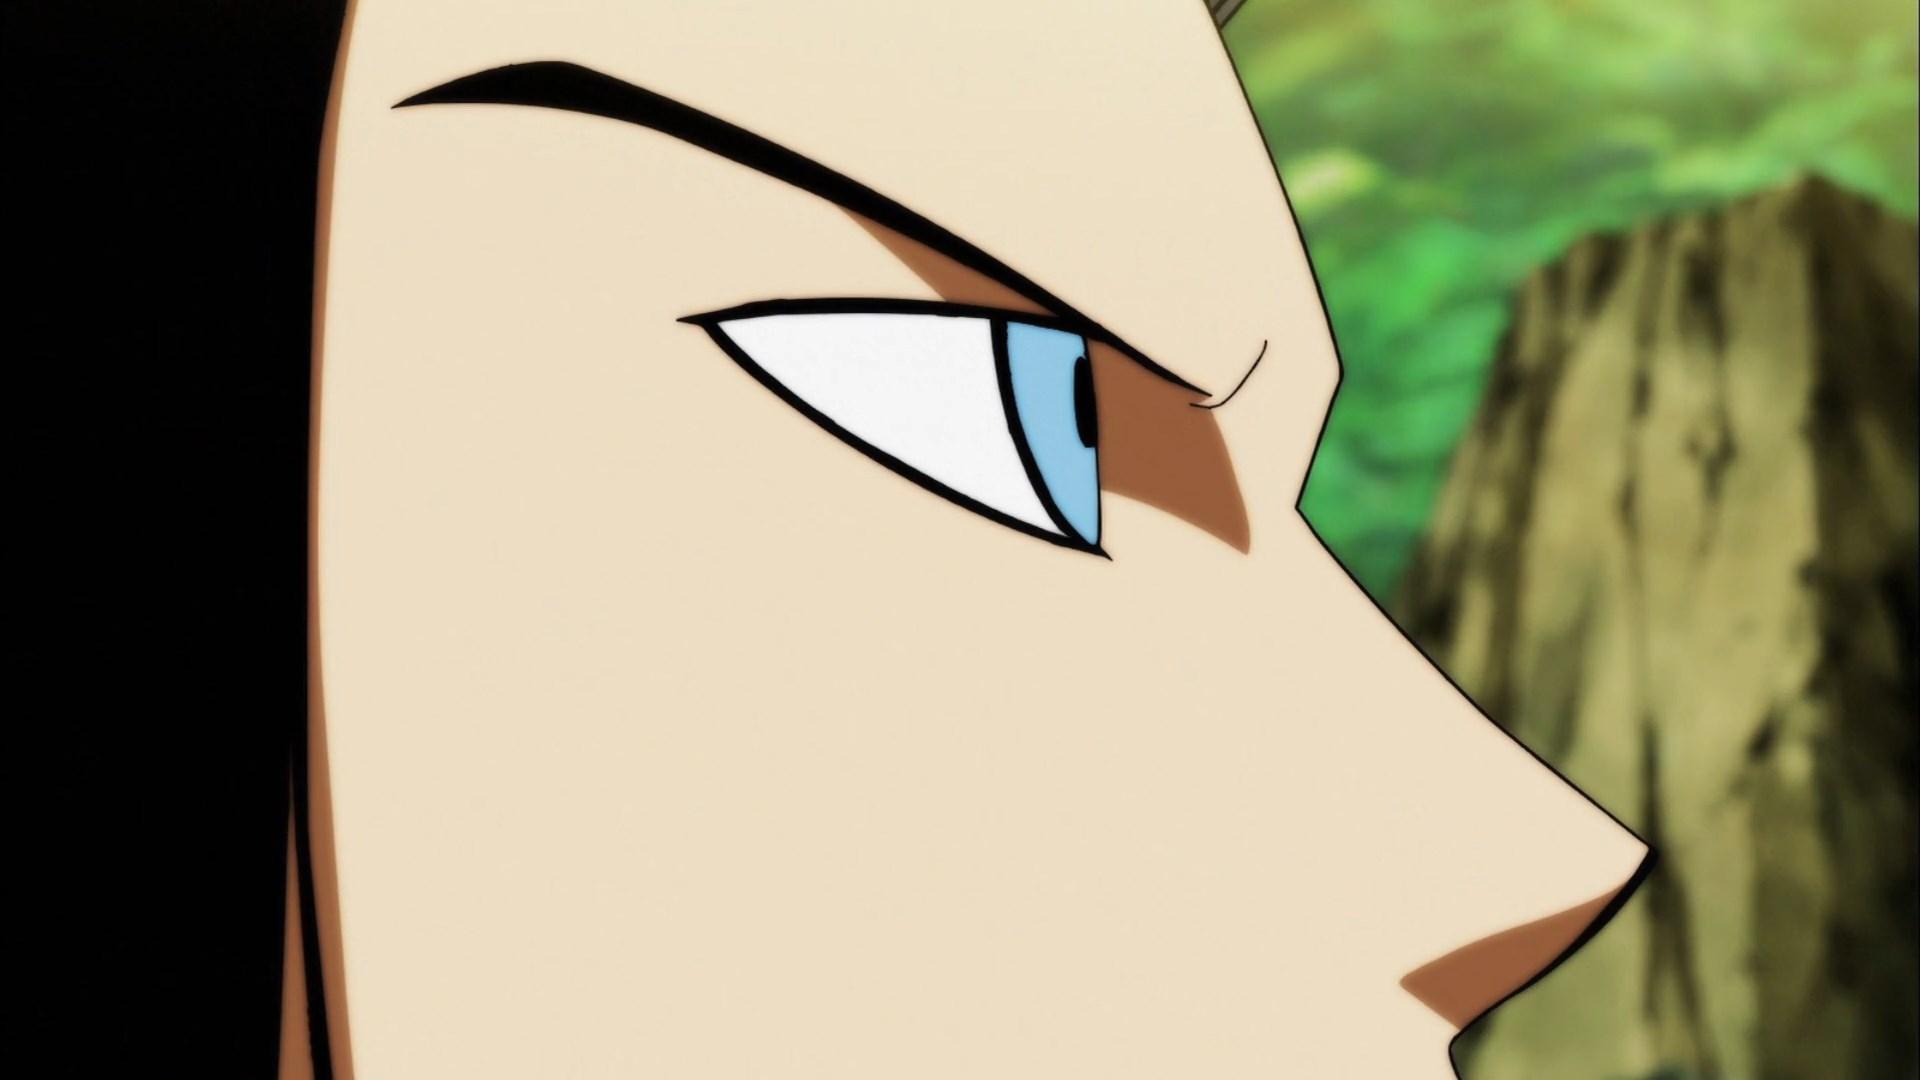 [HorribleSubs] Dragon Ball Super - 121 [1080p].mkv_snapshot_15.52